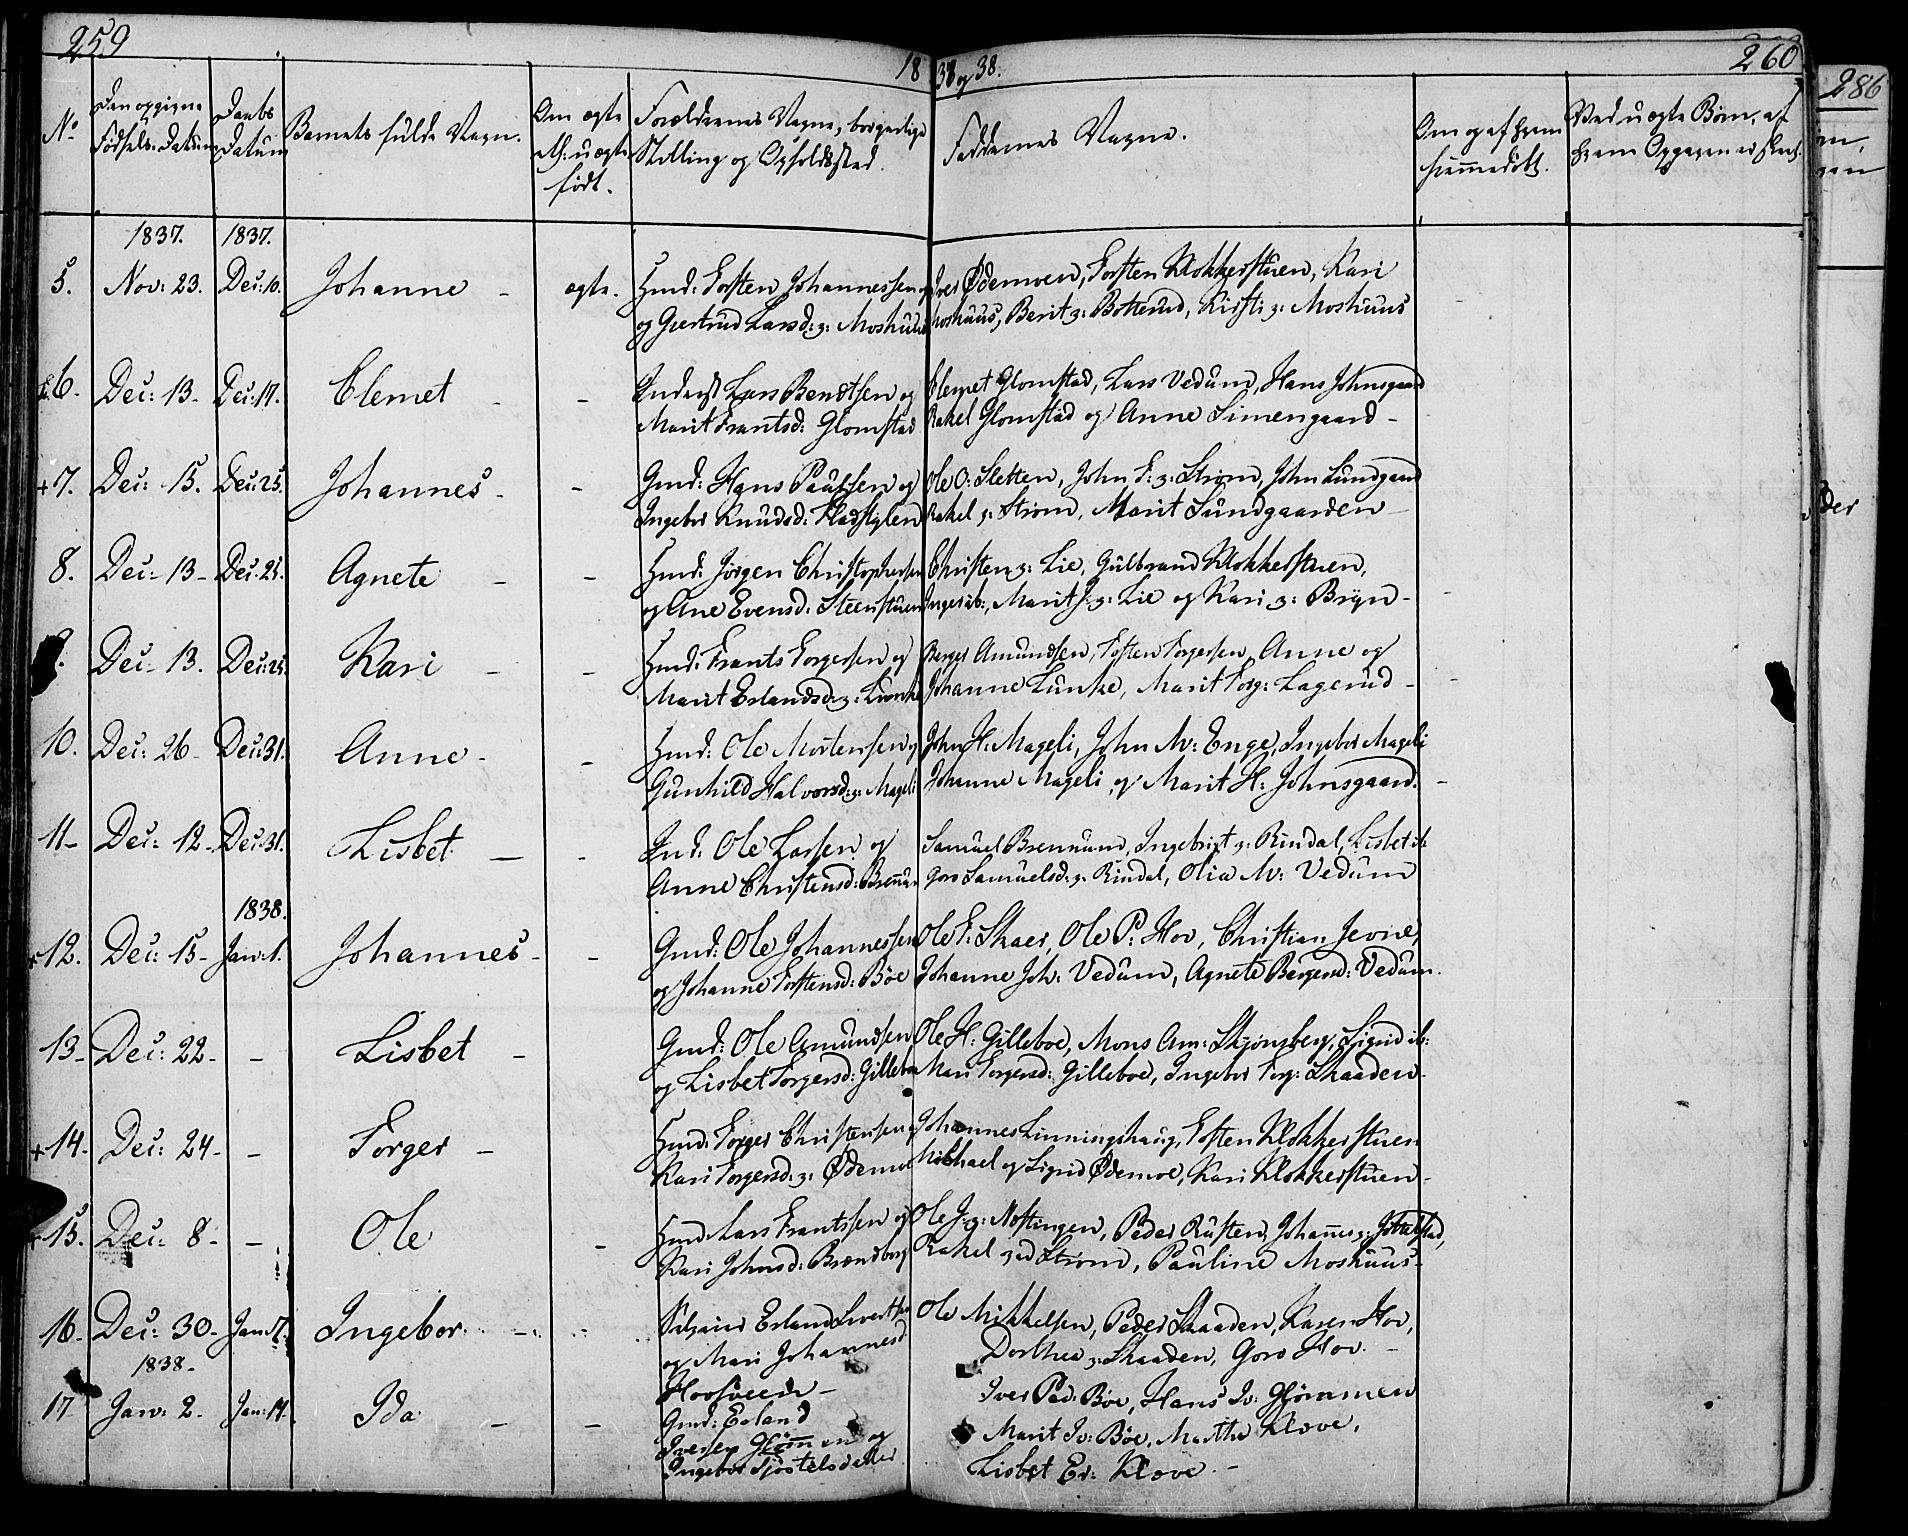 SAH, Øyer prestekontor, Ministerialbok nr. 4, 1824-1841, s. 259-260